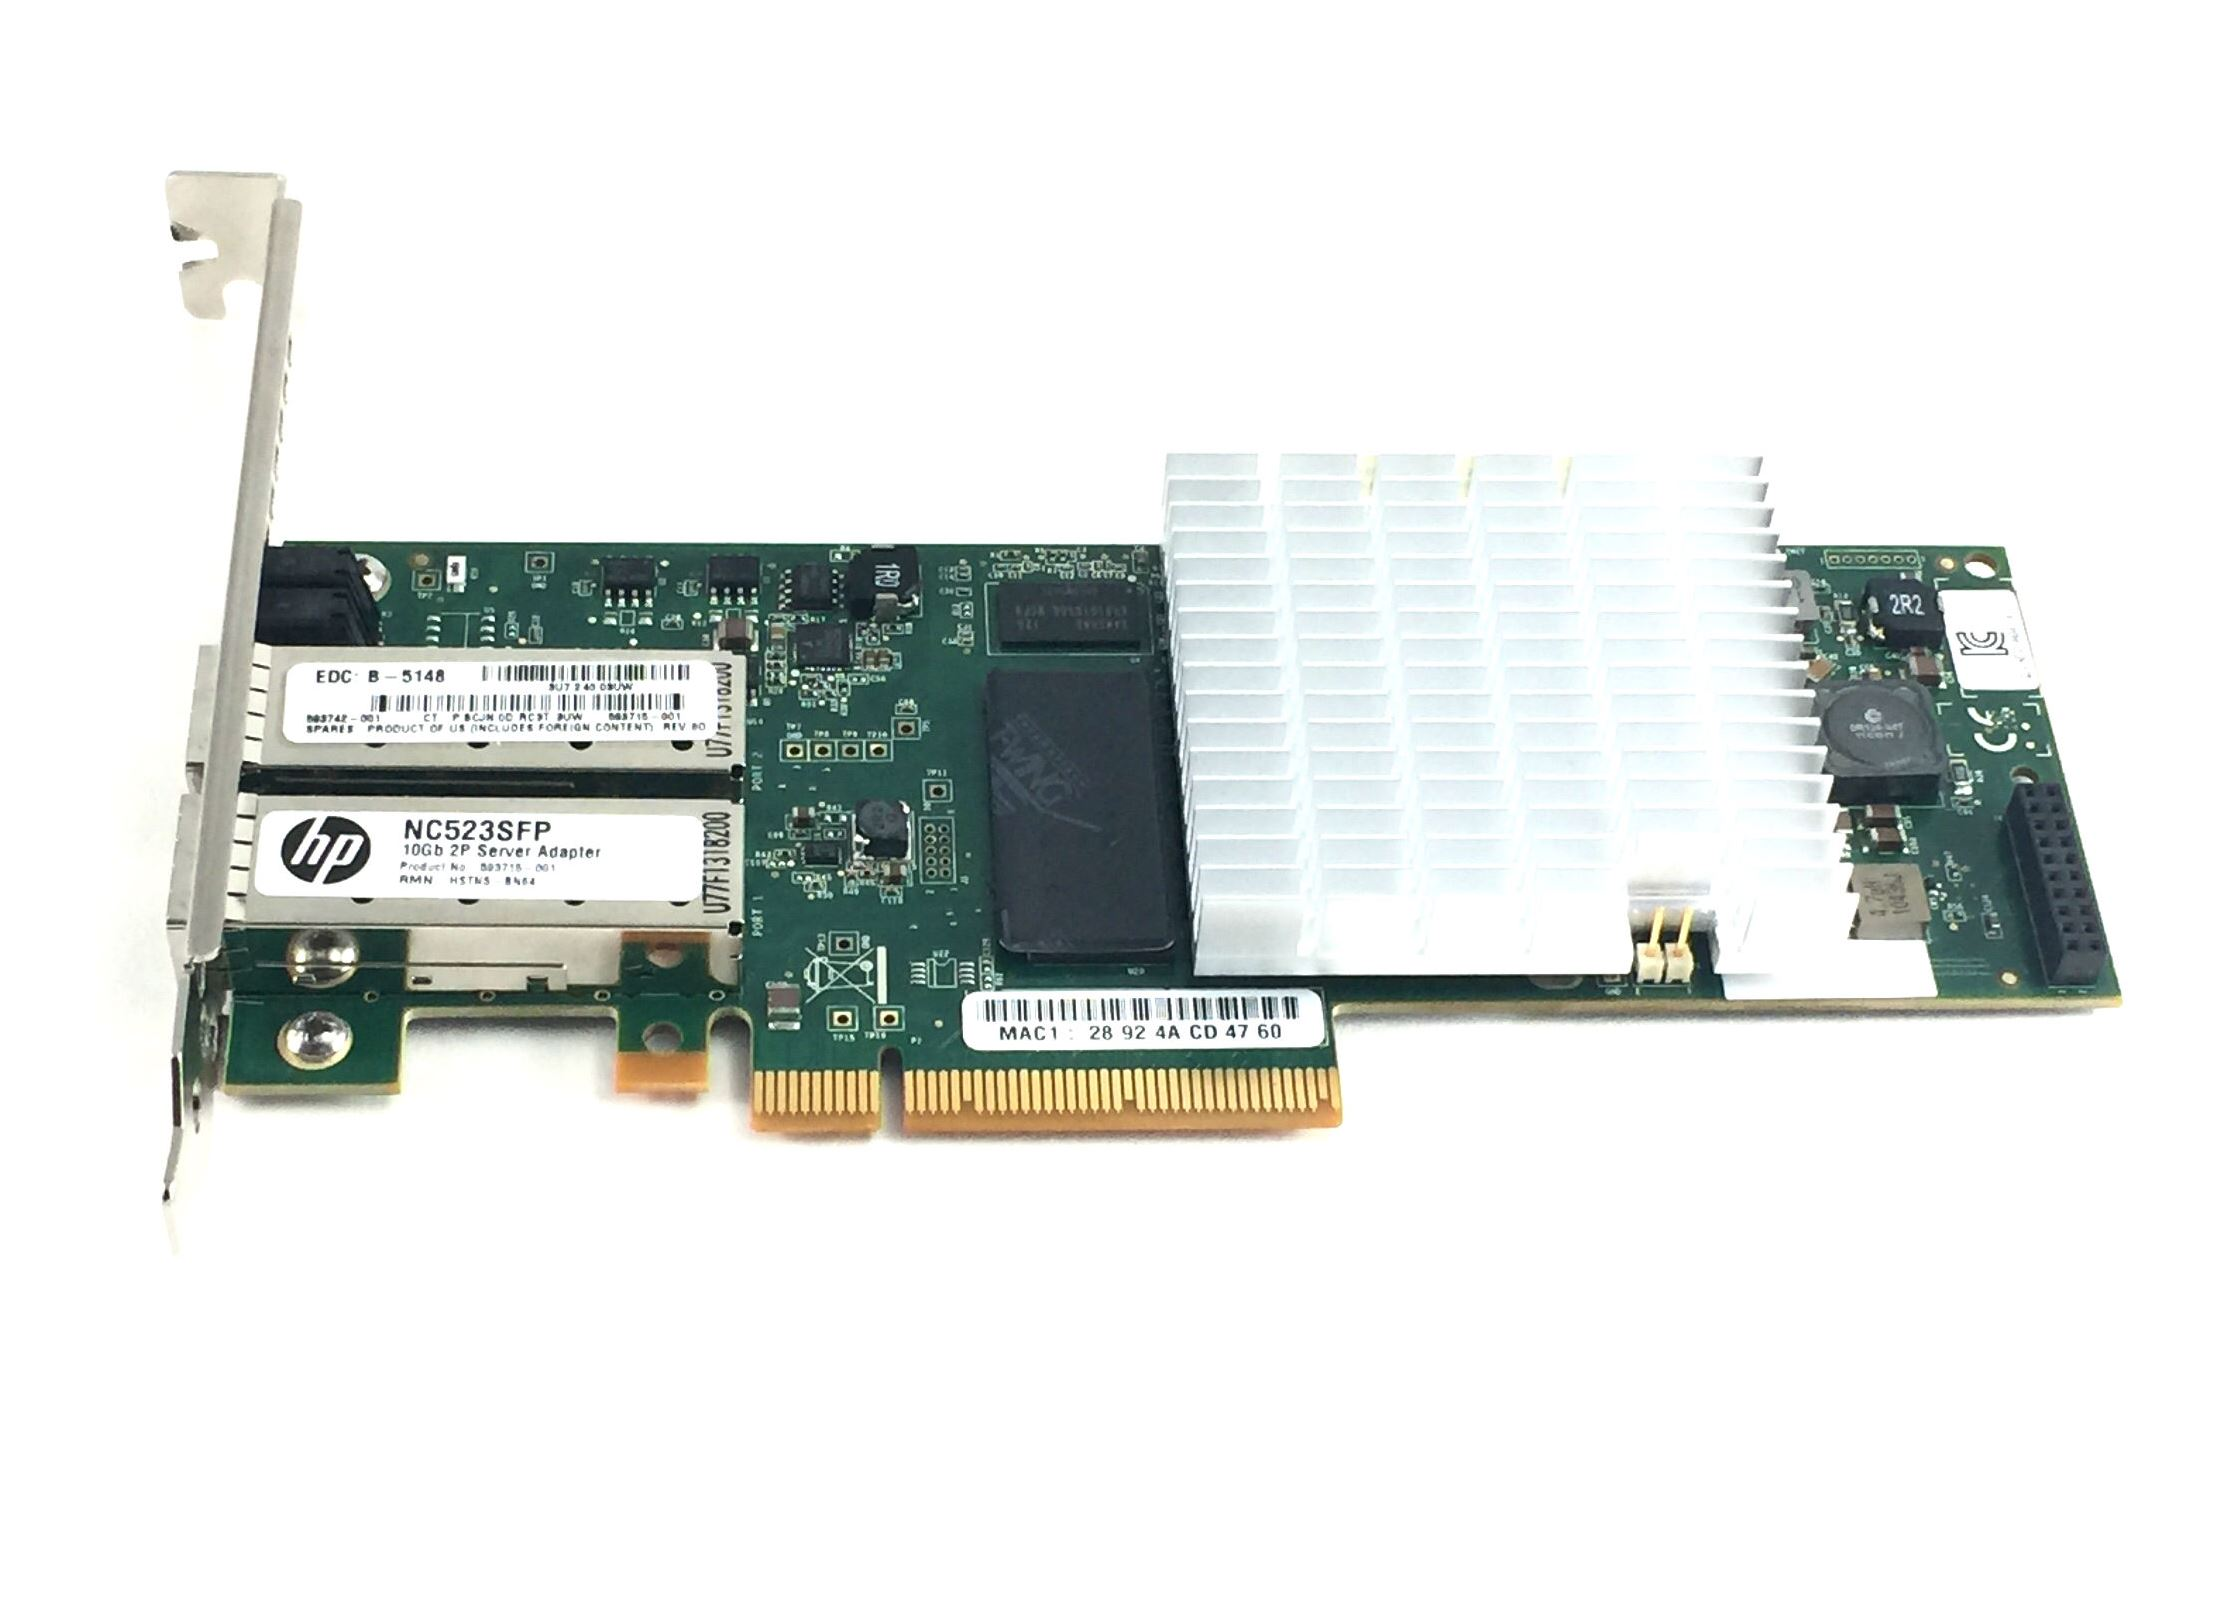 HP Nc523SFP Qle3242 10GB Dual Port SFP Network Adapter (593742-001)